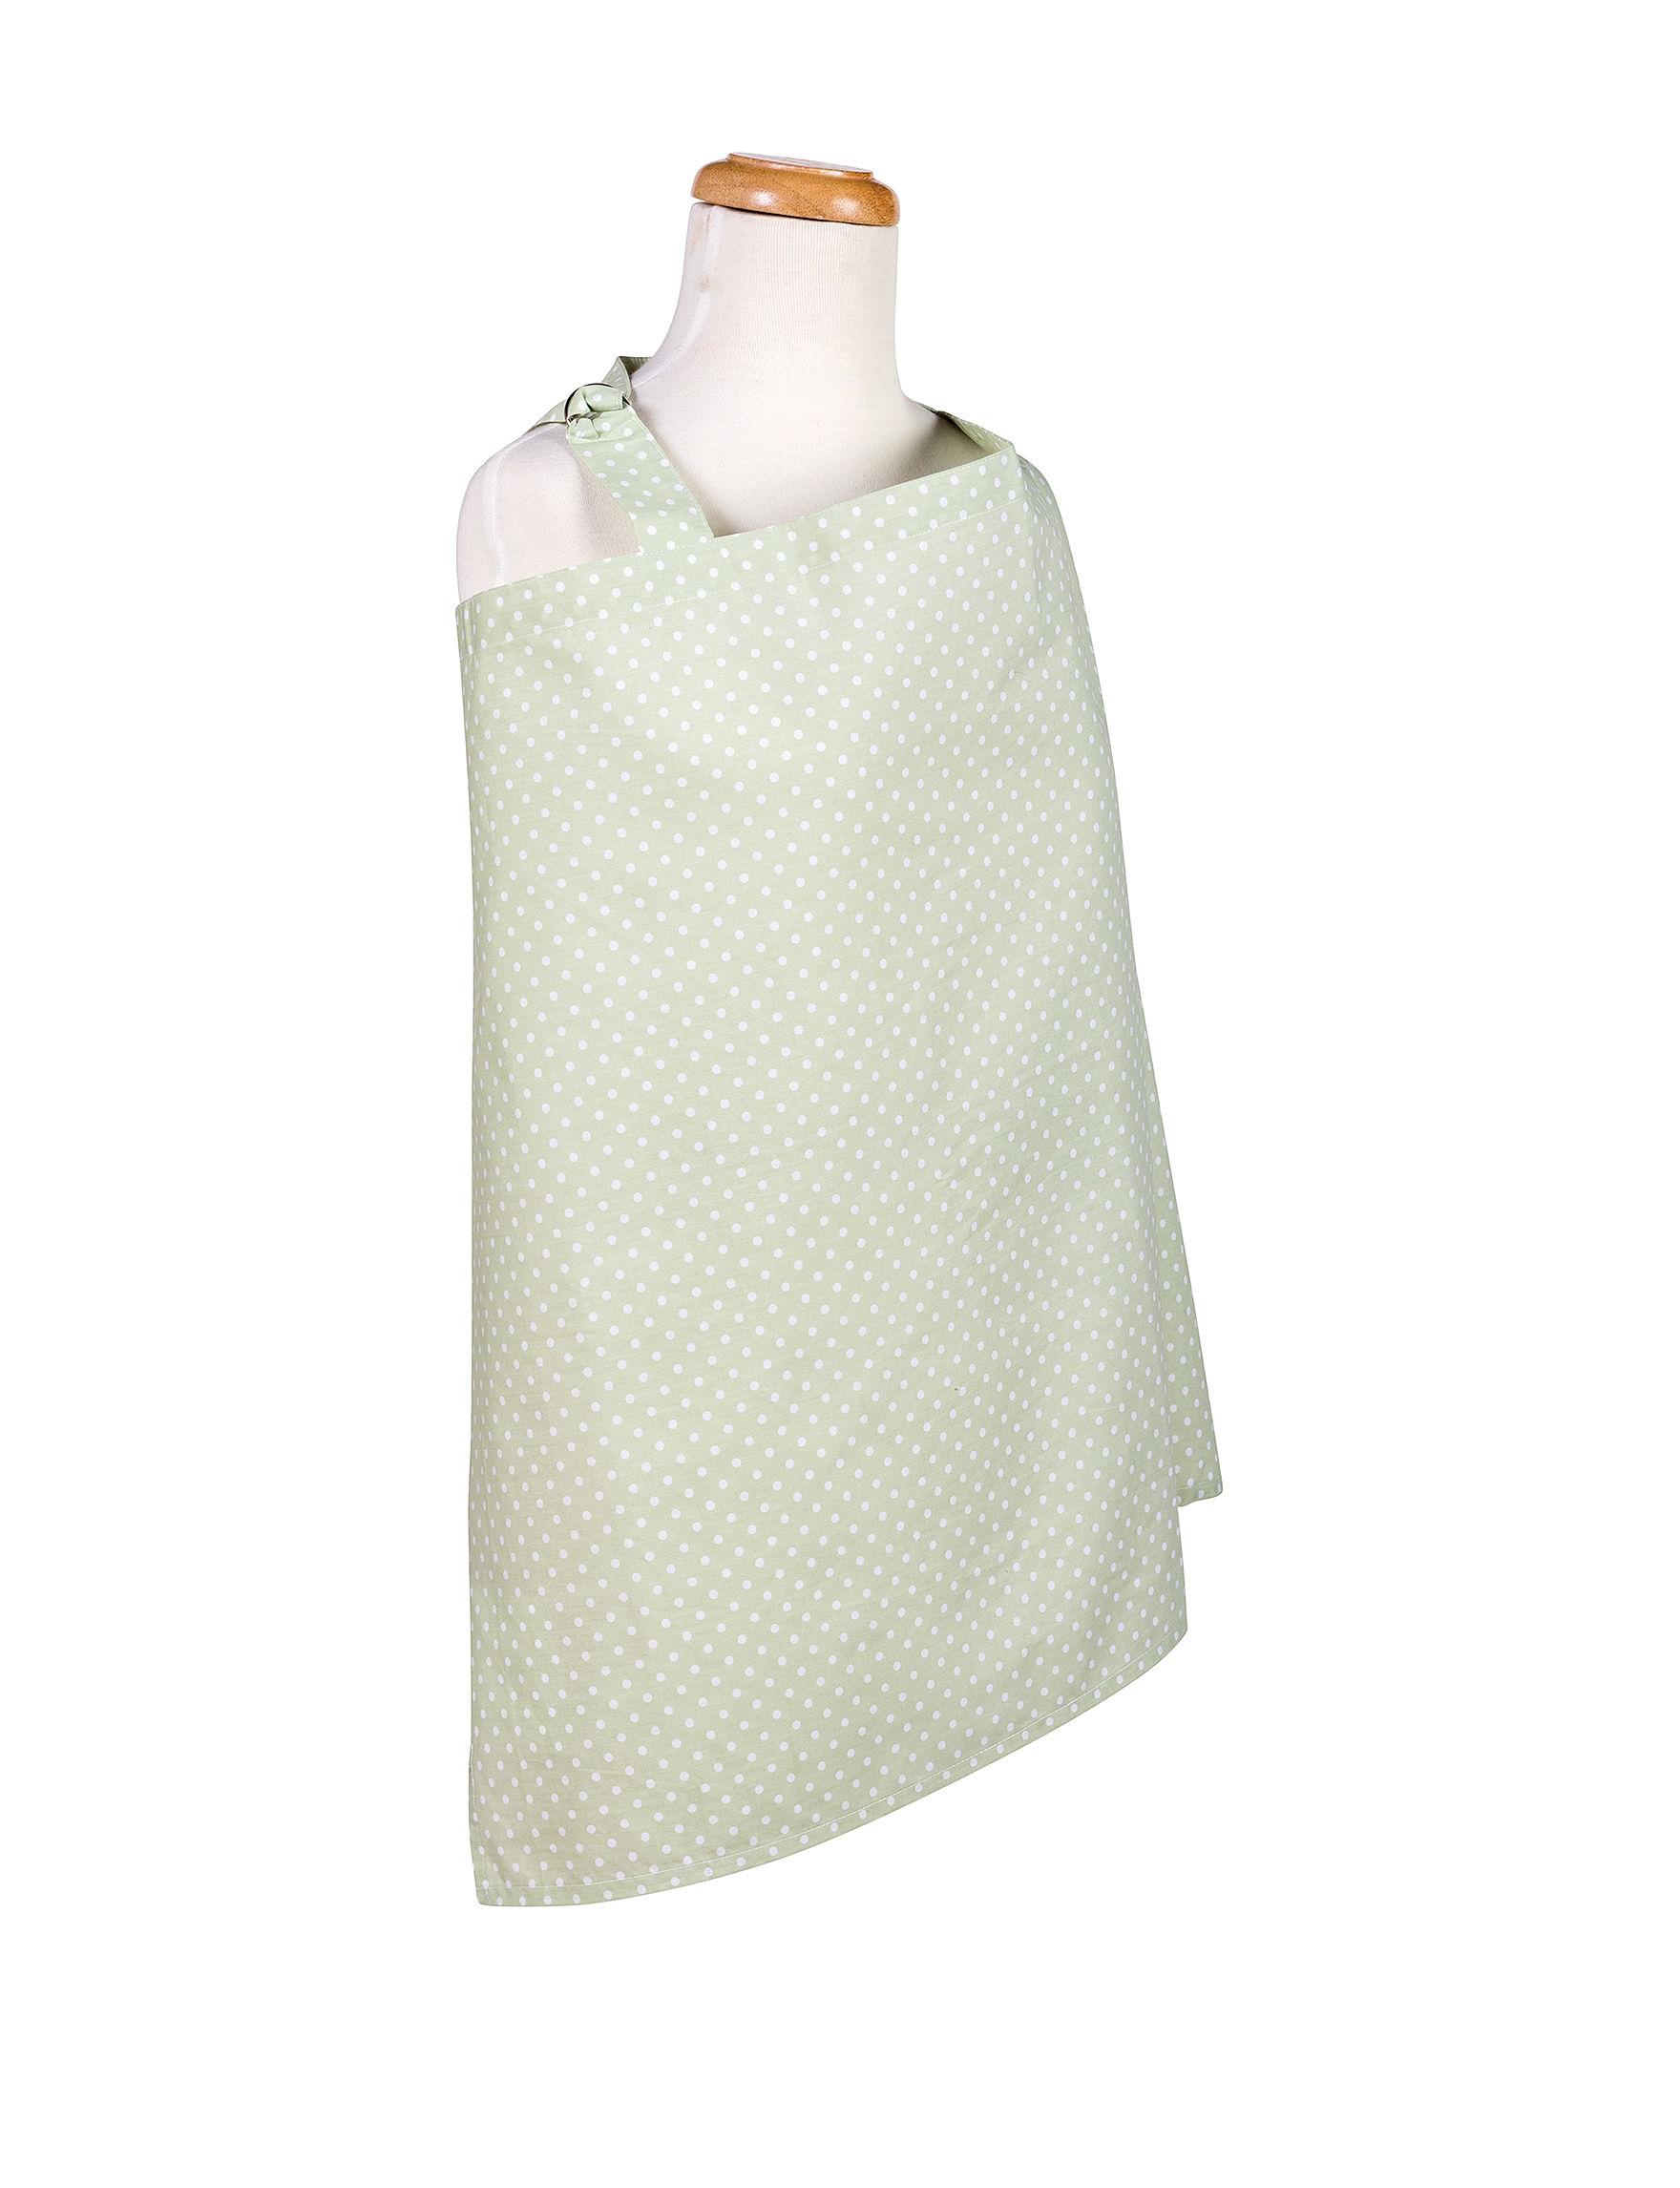 Trend Lab Green / White Breastfeeding